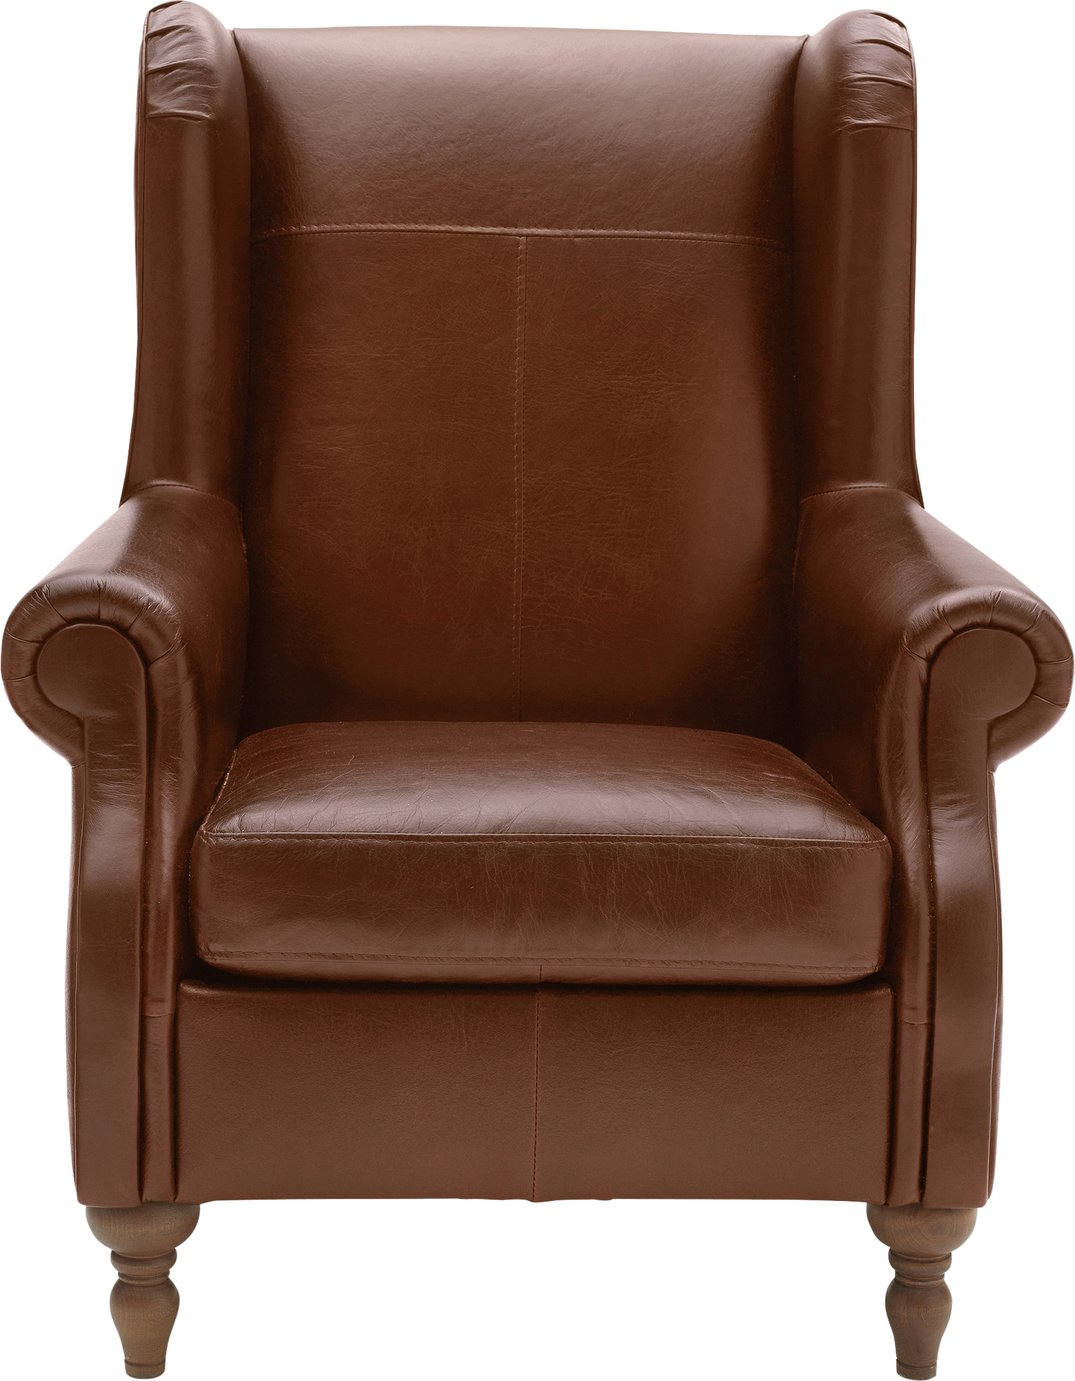 Argos Home Argyll Leather High Back Chair - Tan